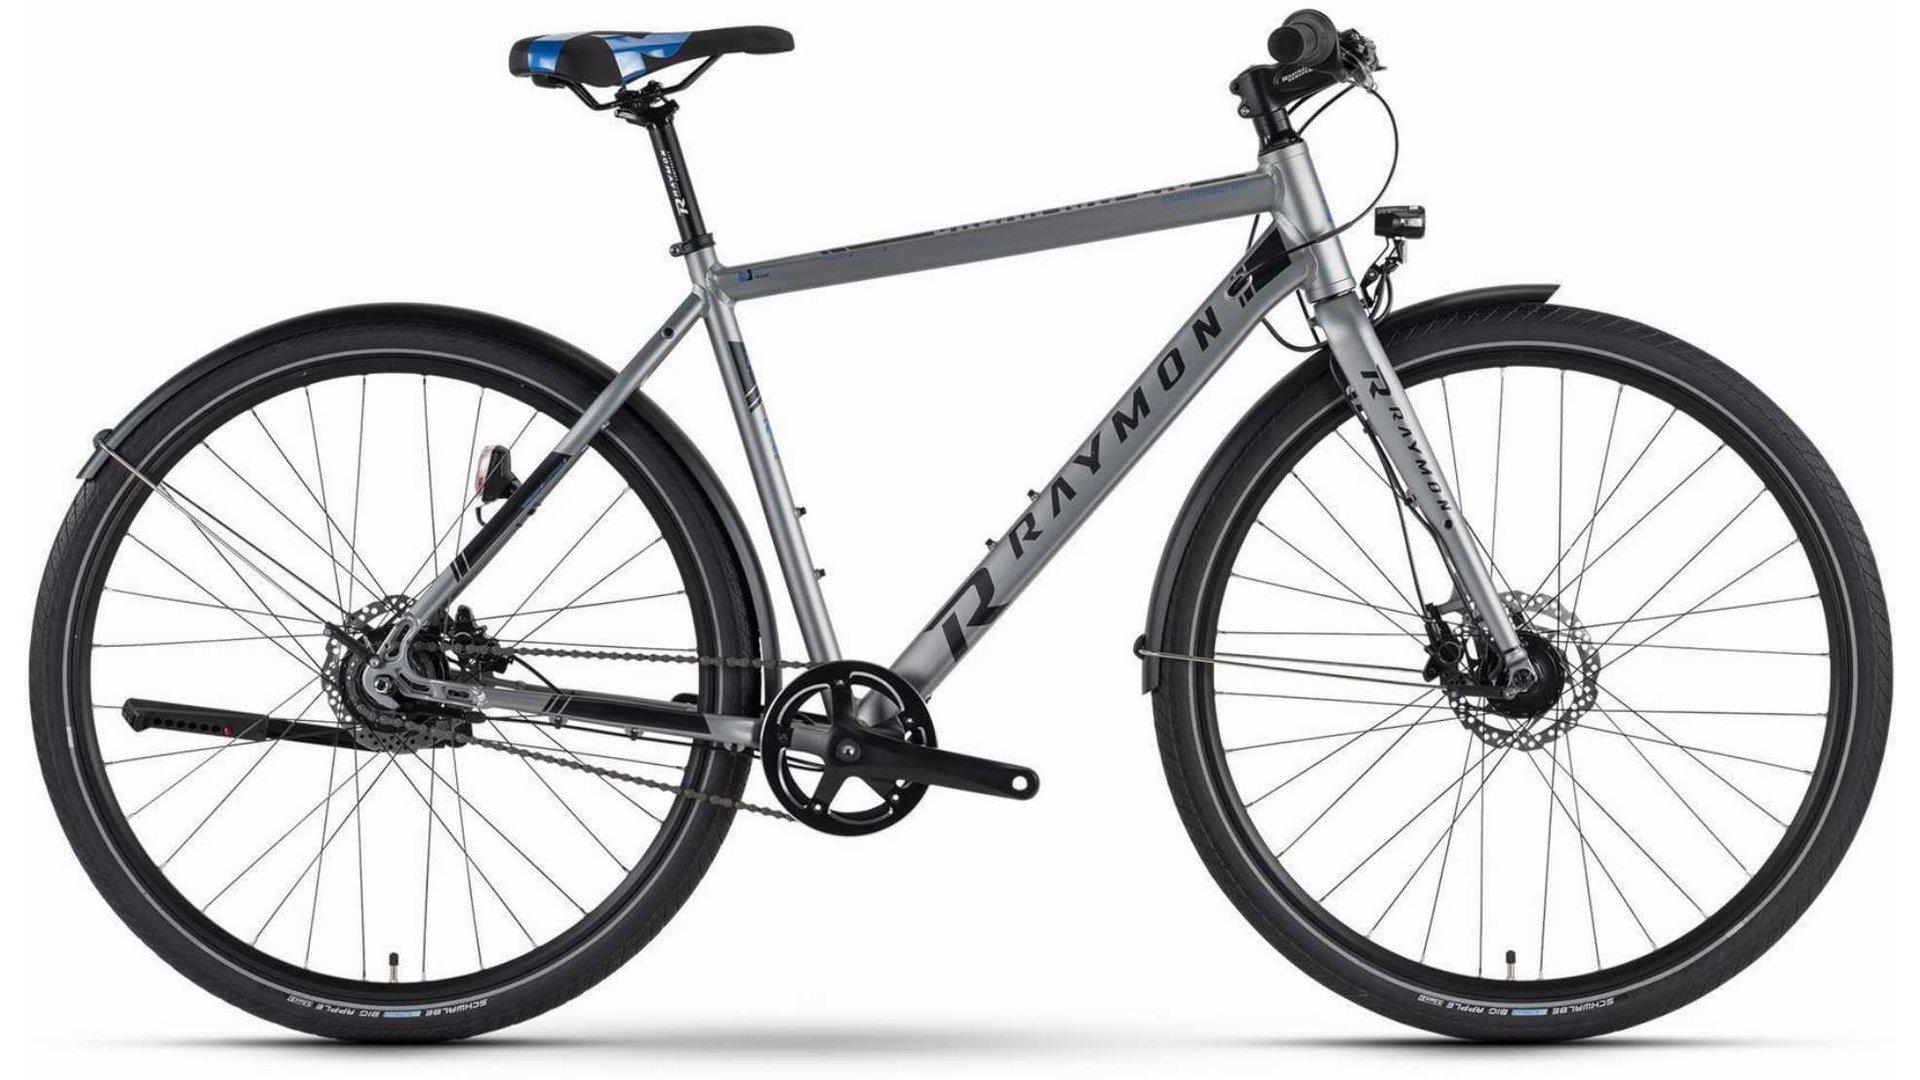 Fahrrad Raymon UrbanRay 2.0 Urban - 52cm